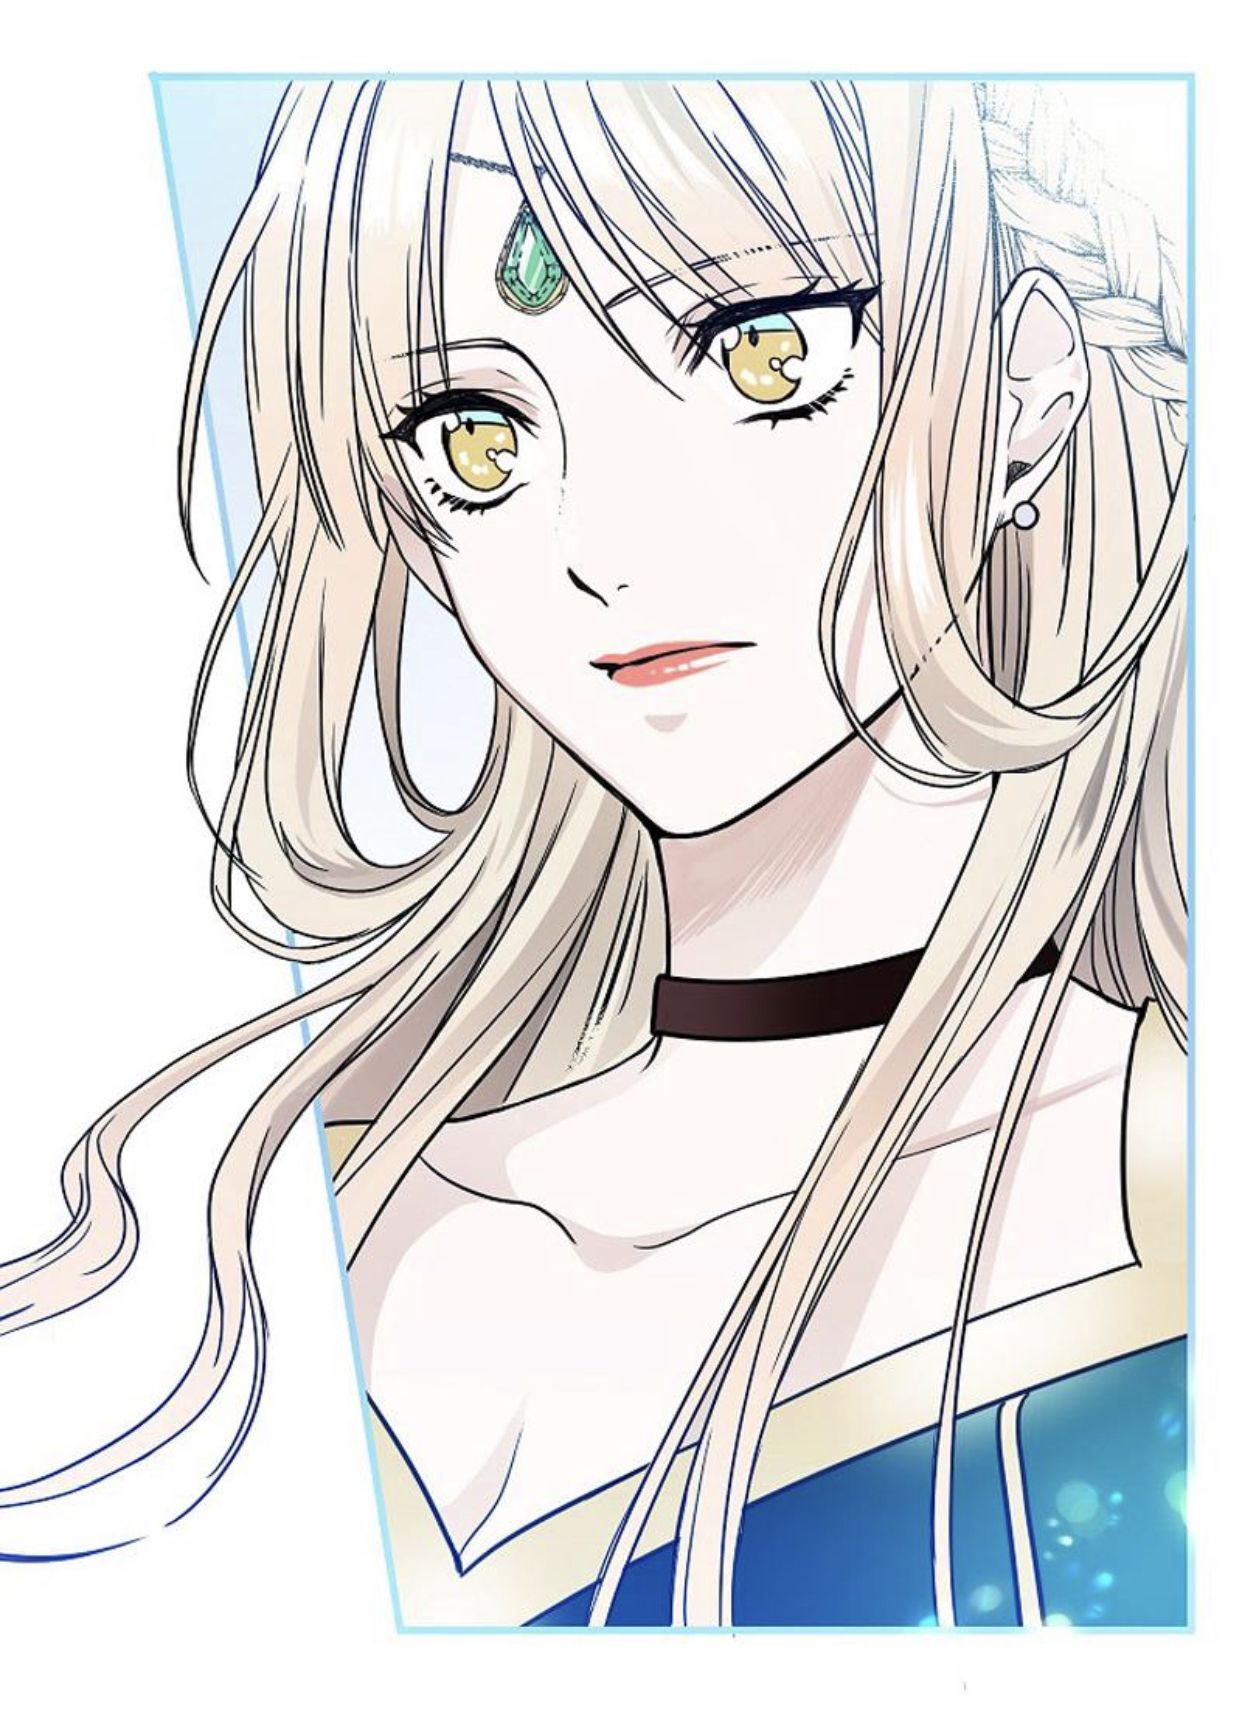 Pin oleh Animemangaluver di My Lord, the Wolf Queen Manga